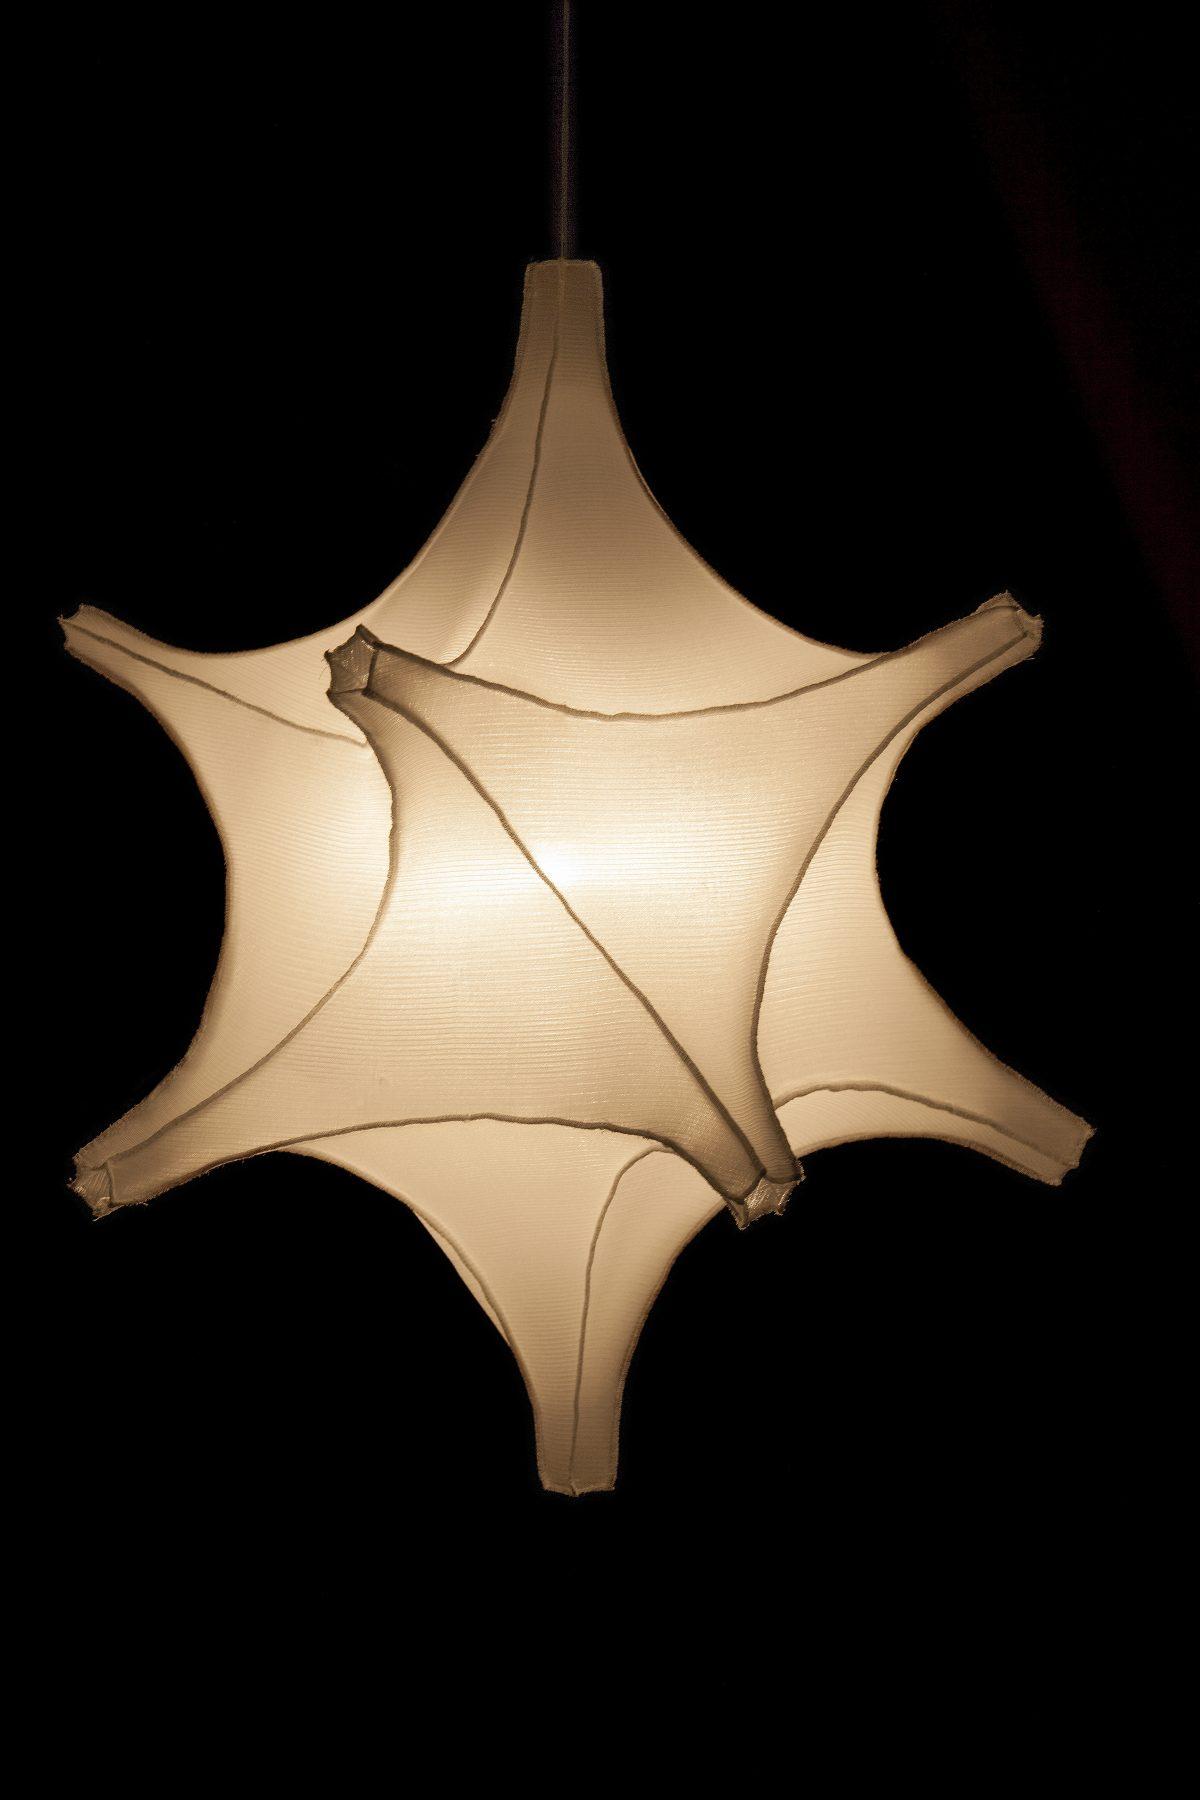 radiolaria Astrosphera specula bernotat hanglamp aan